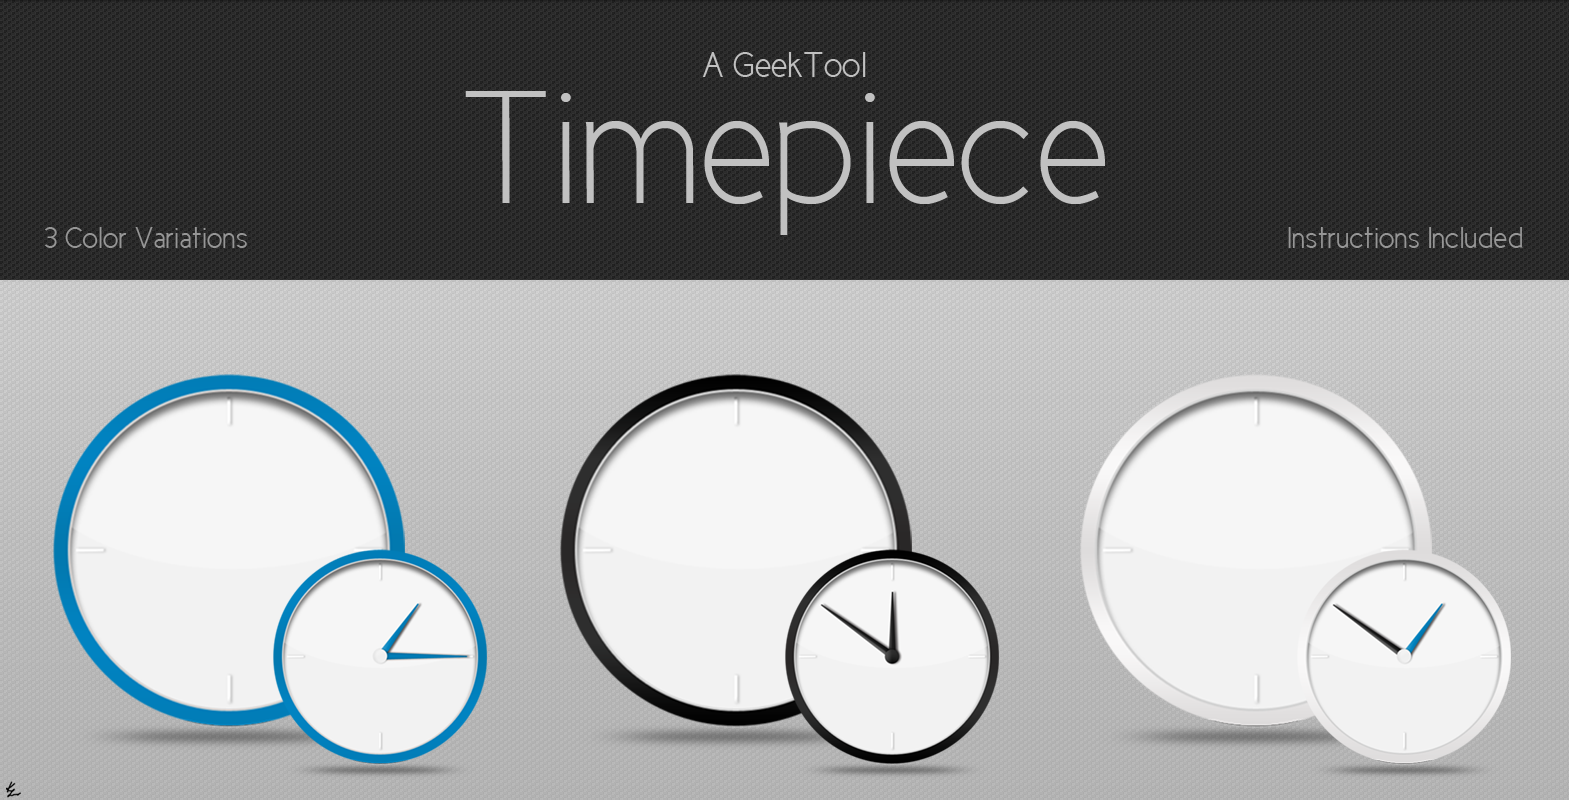 Timepiece by midnighttokerkate